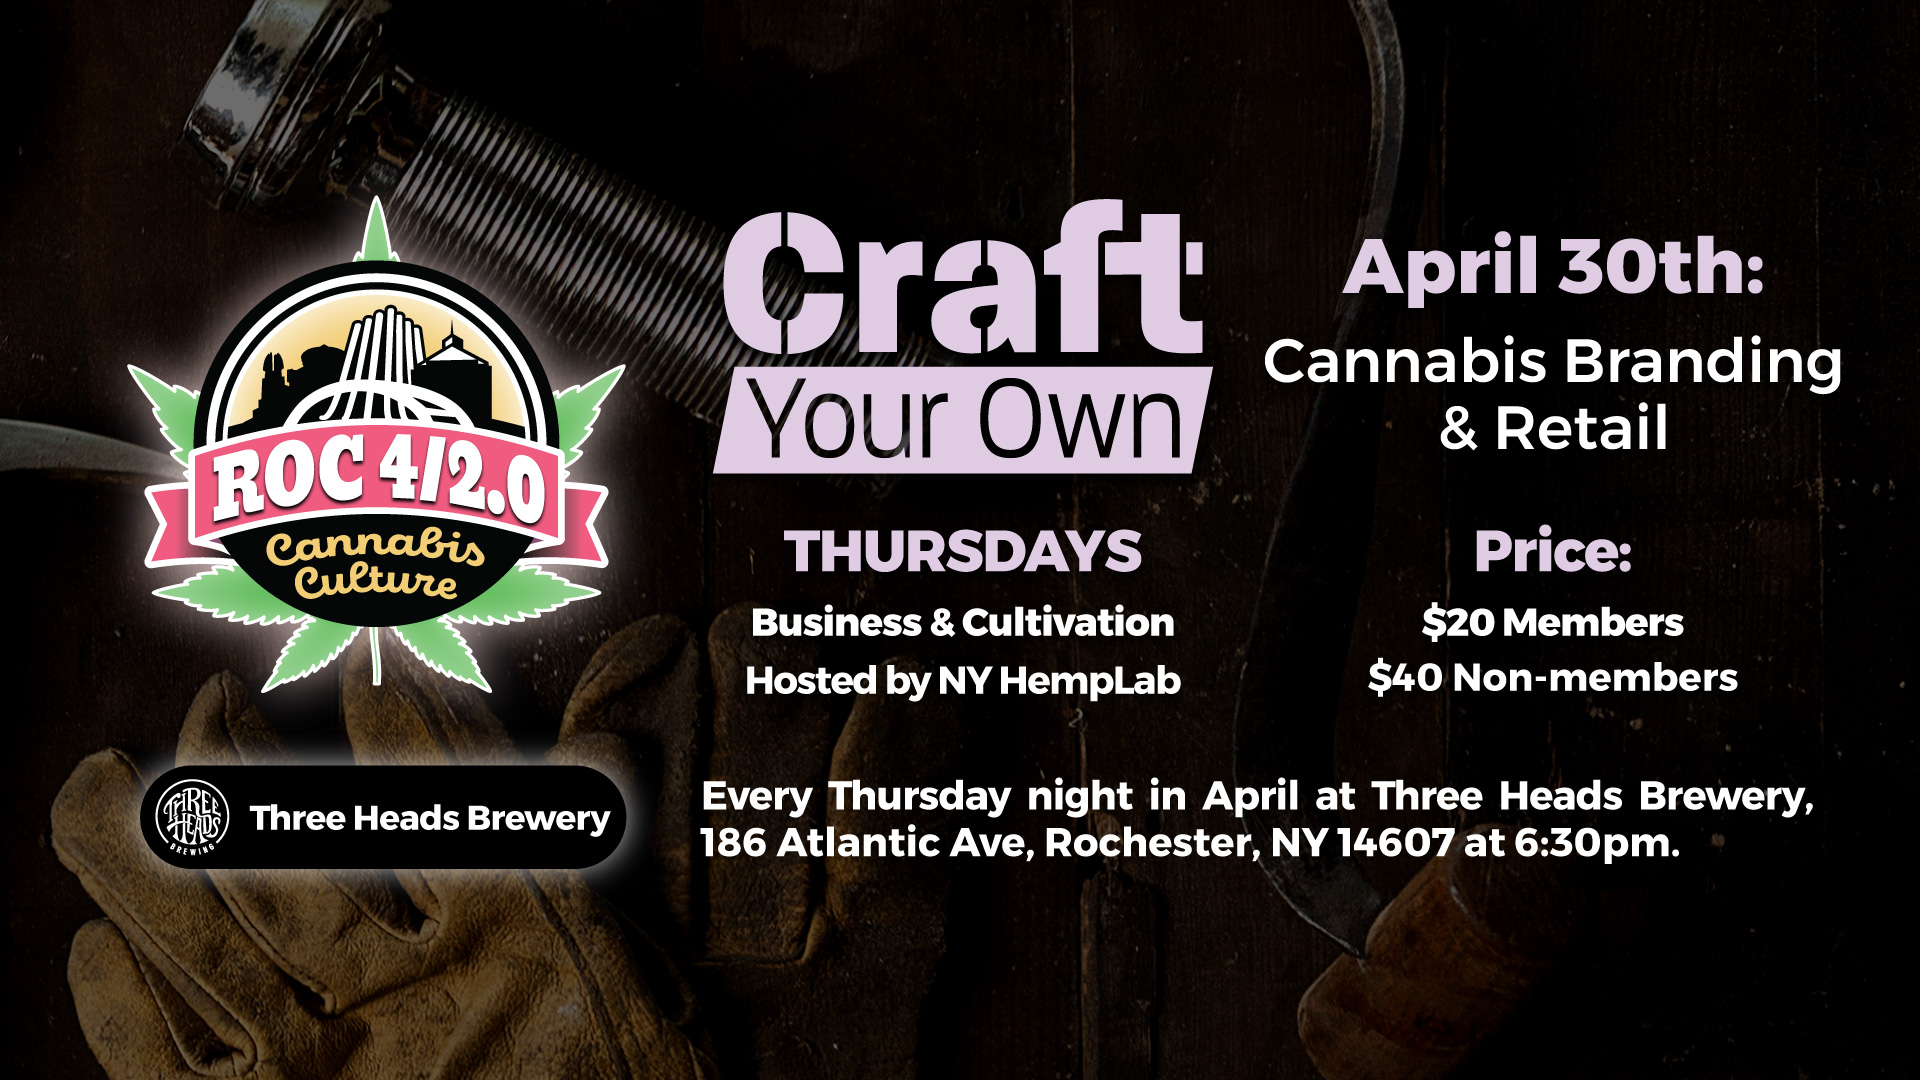 4/30 Cannabis Branding & Retail